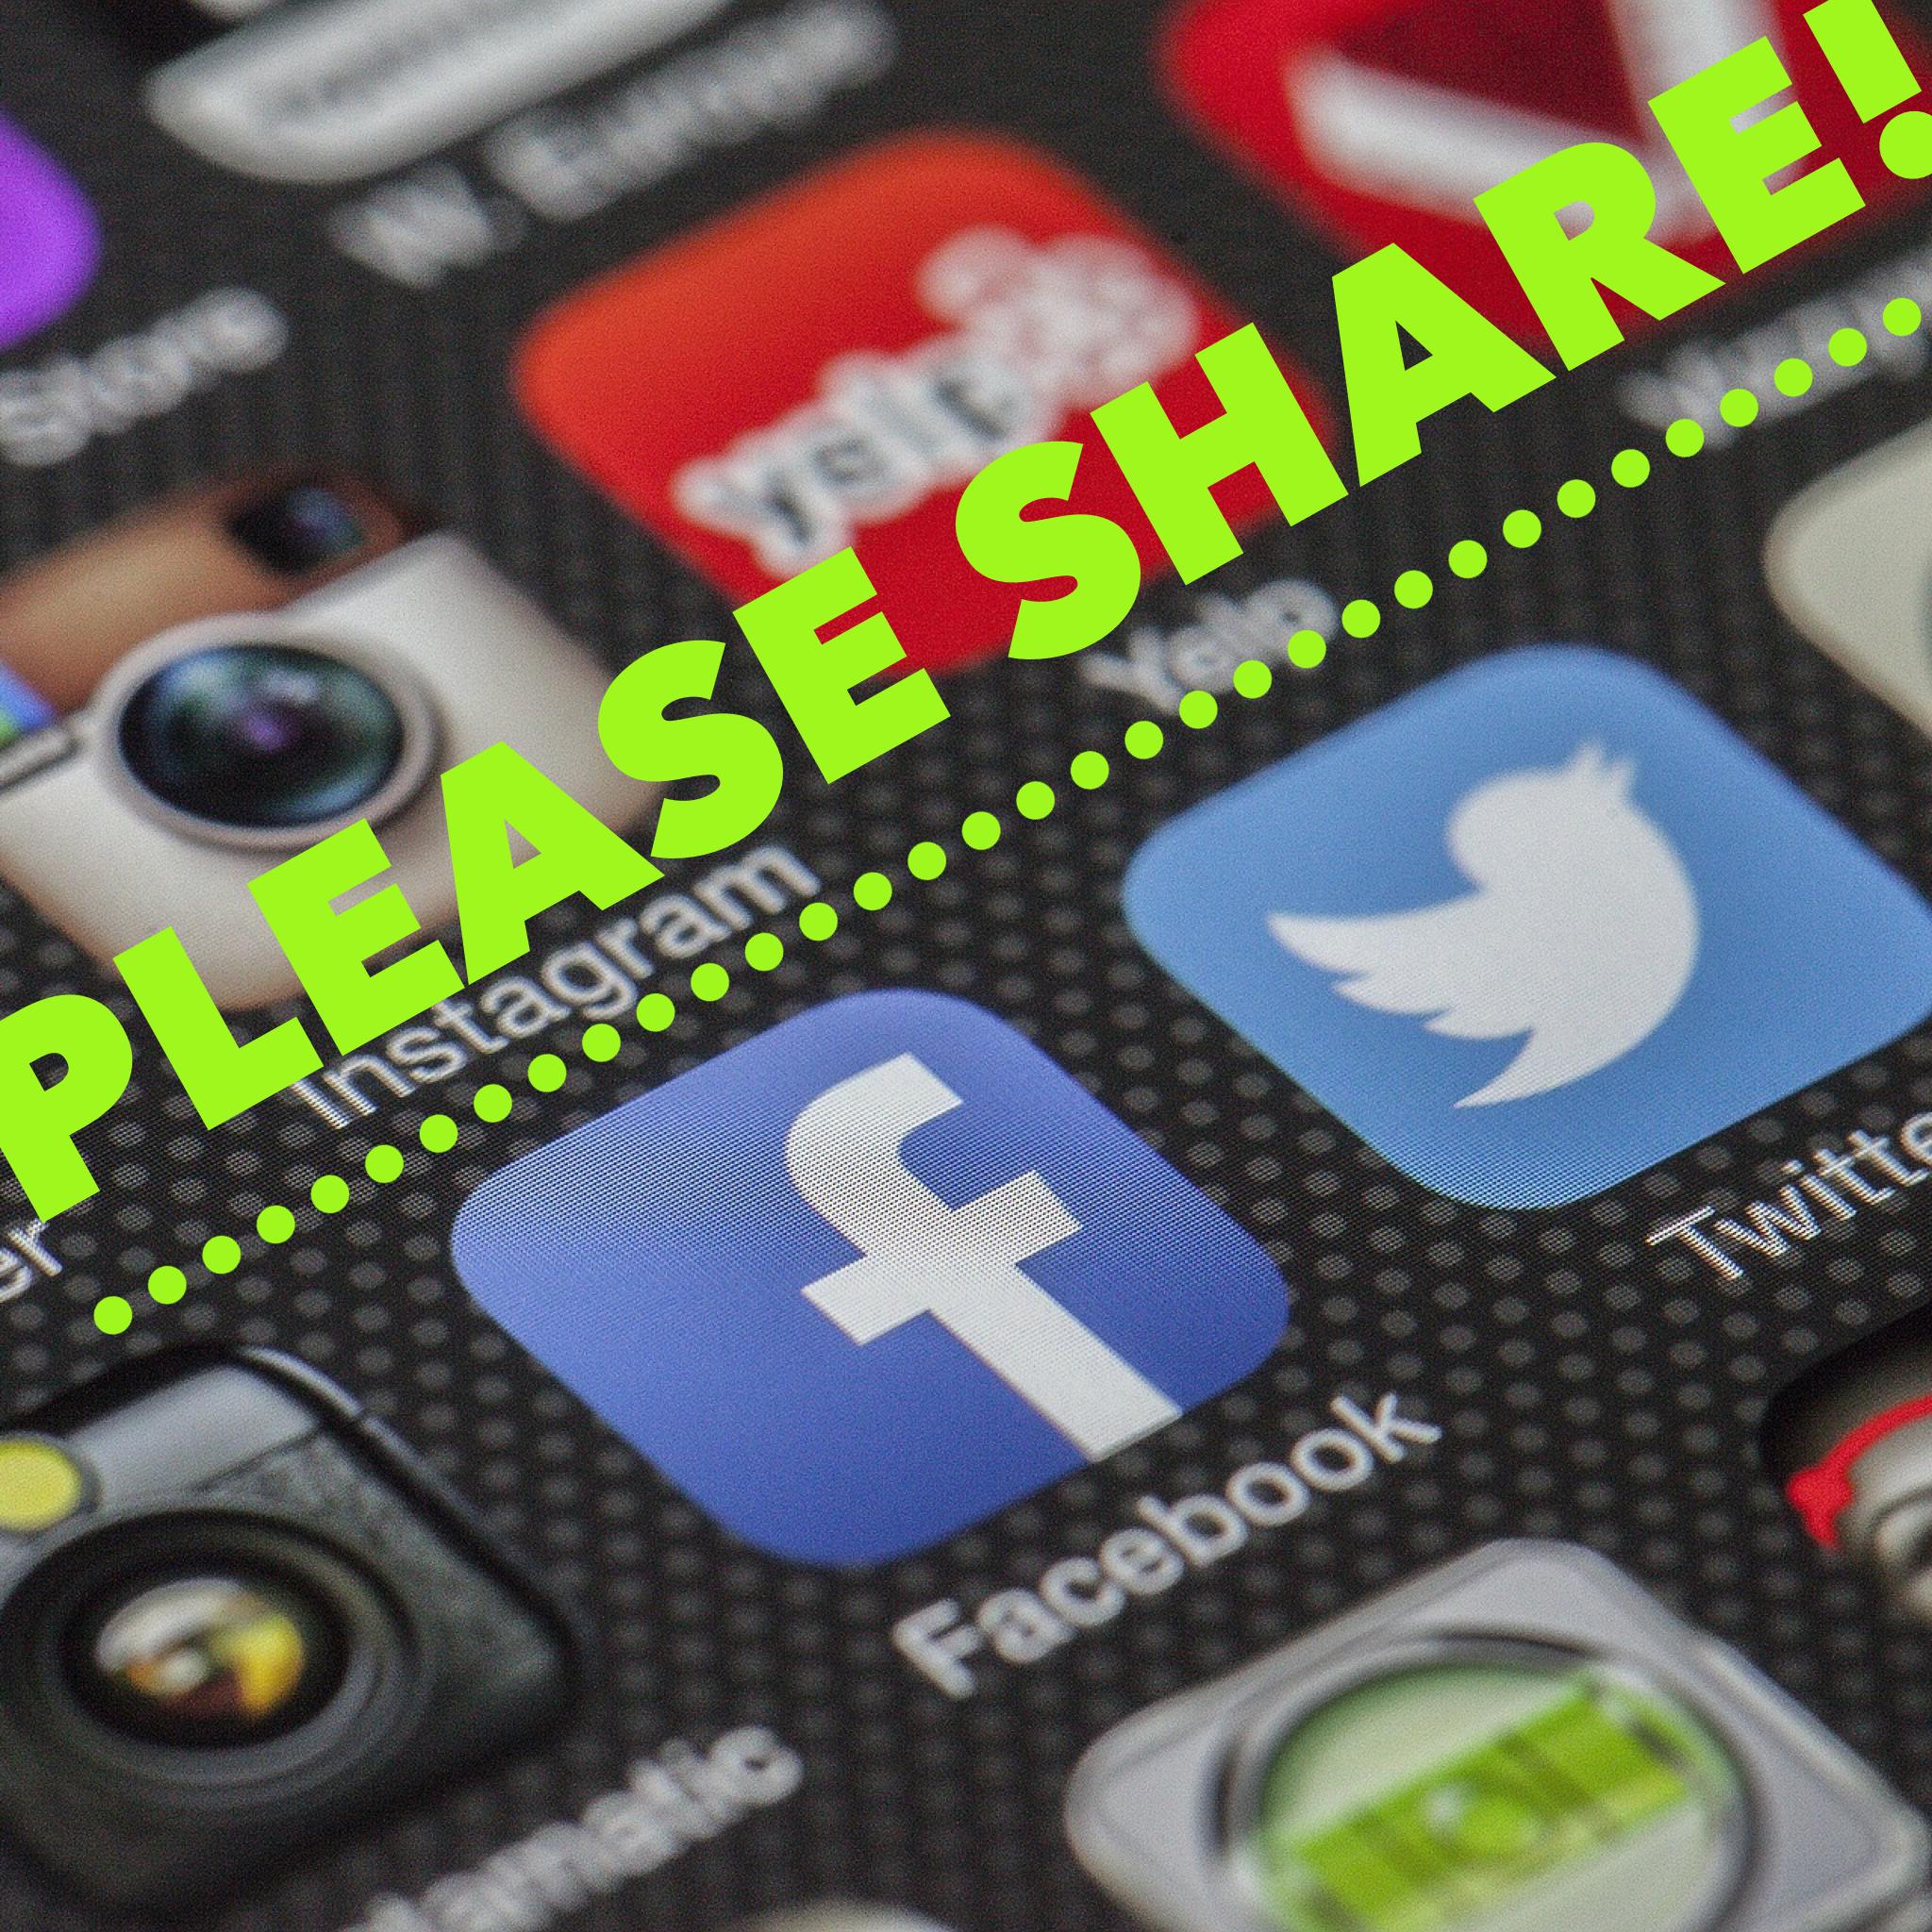 Social media share request